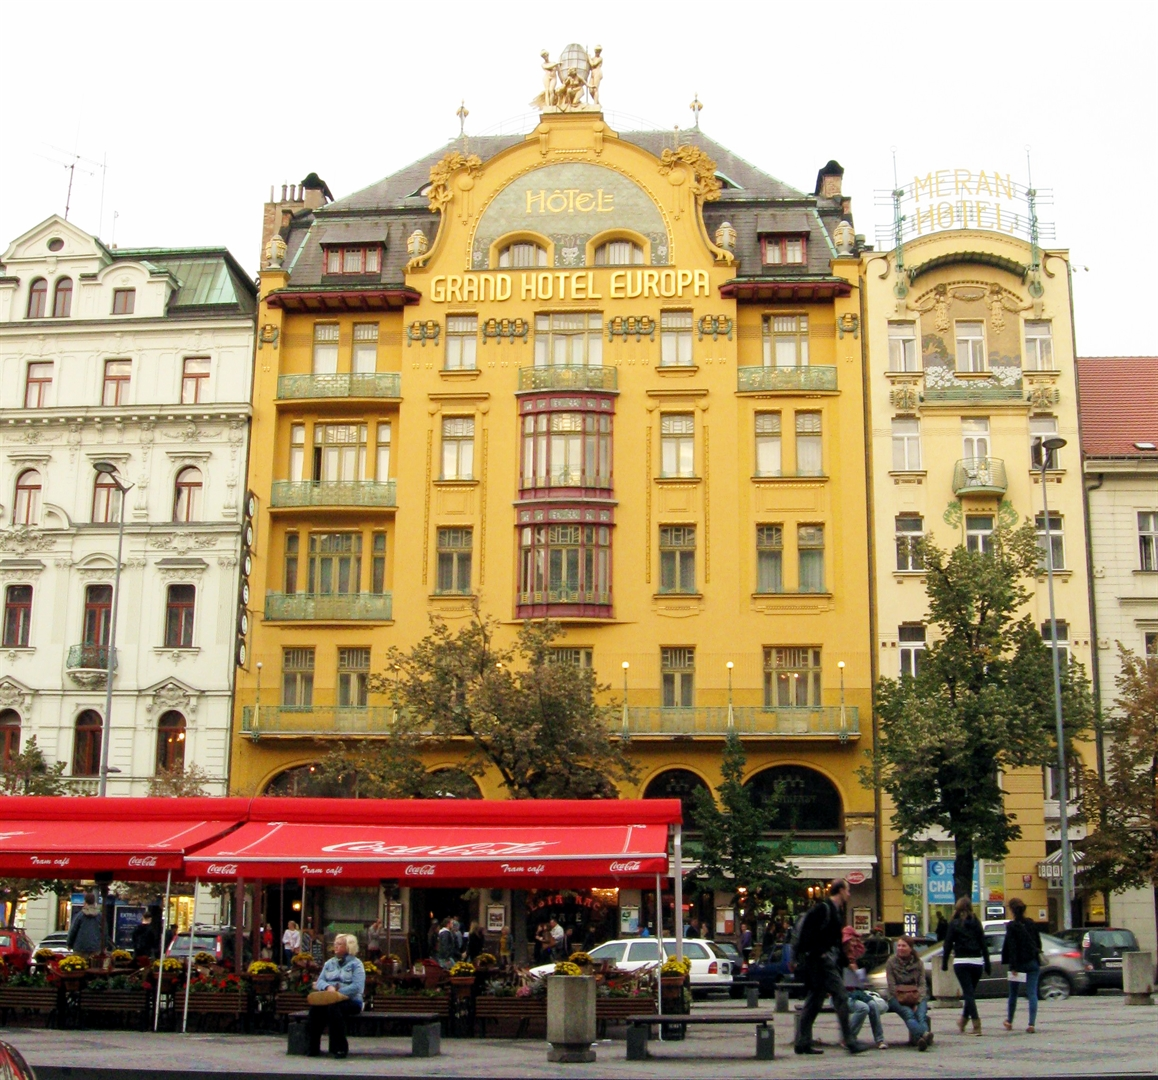 Grand Hotel Europa (Sroubek Hotel) in Prague where Nicholas Winton began making arrangements to bring children out of Czechoslovakia into Britain.